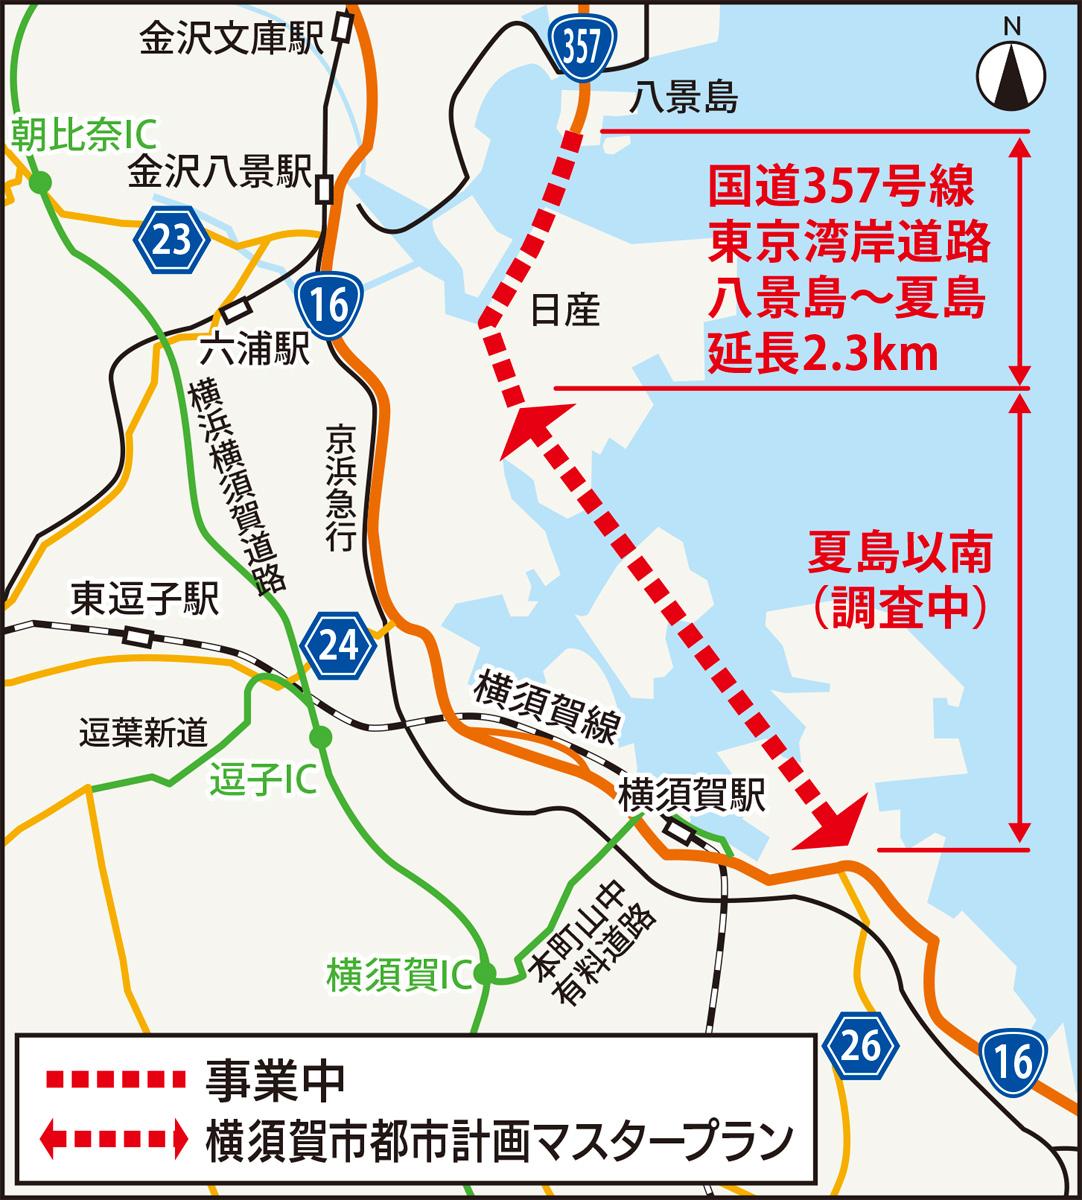 八景島-夏島間が着工